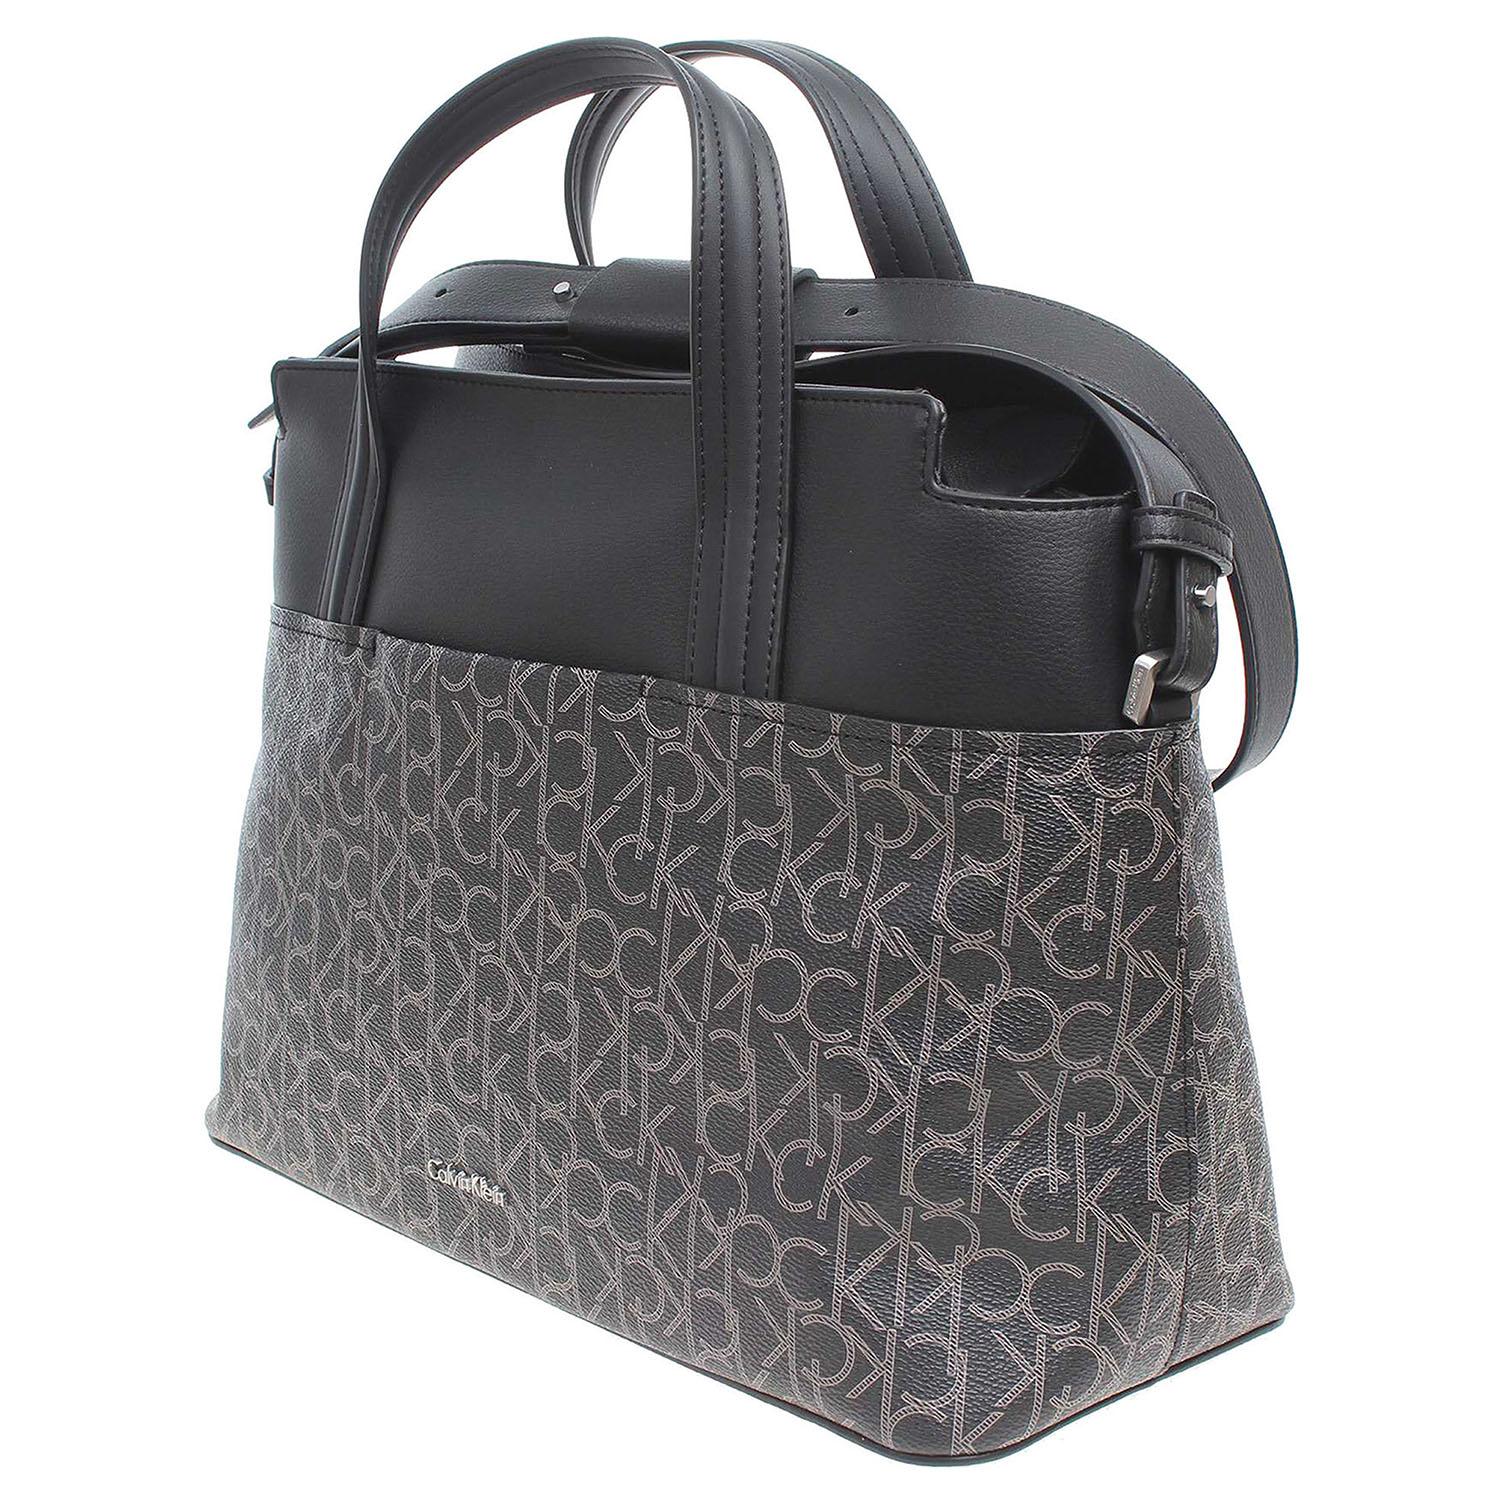 Ecco Calvin Klein dámská kabelka K60K602524910 černá 11891165